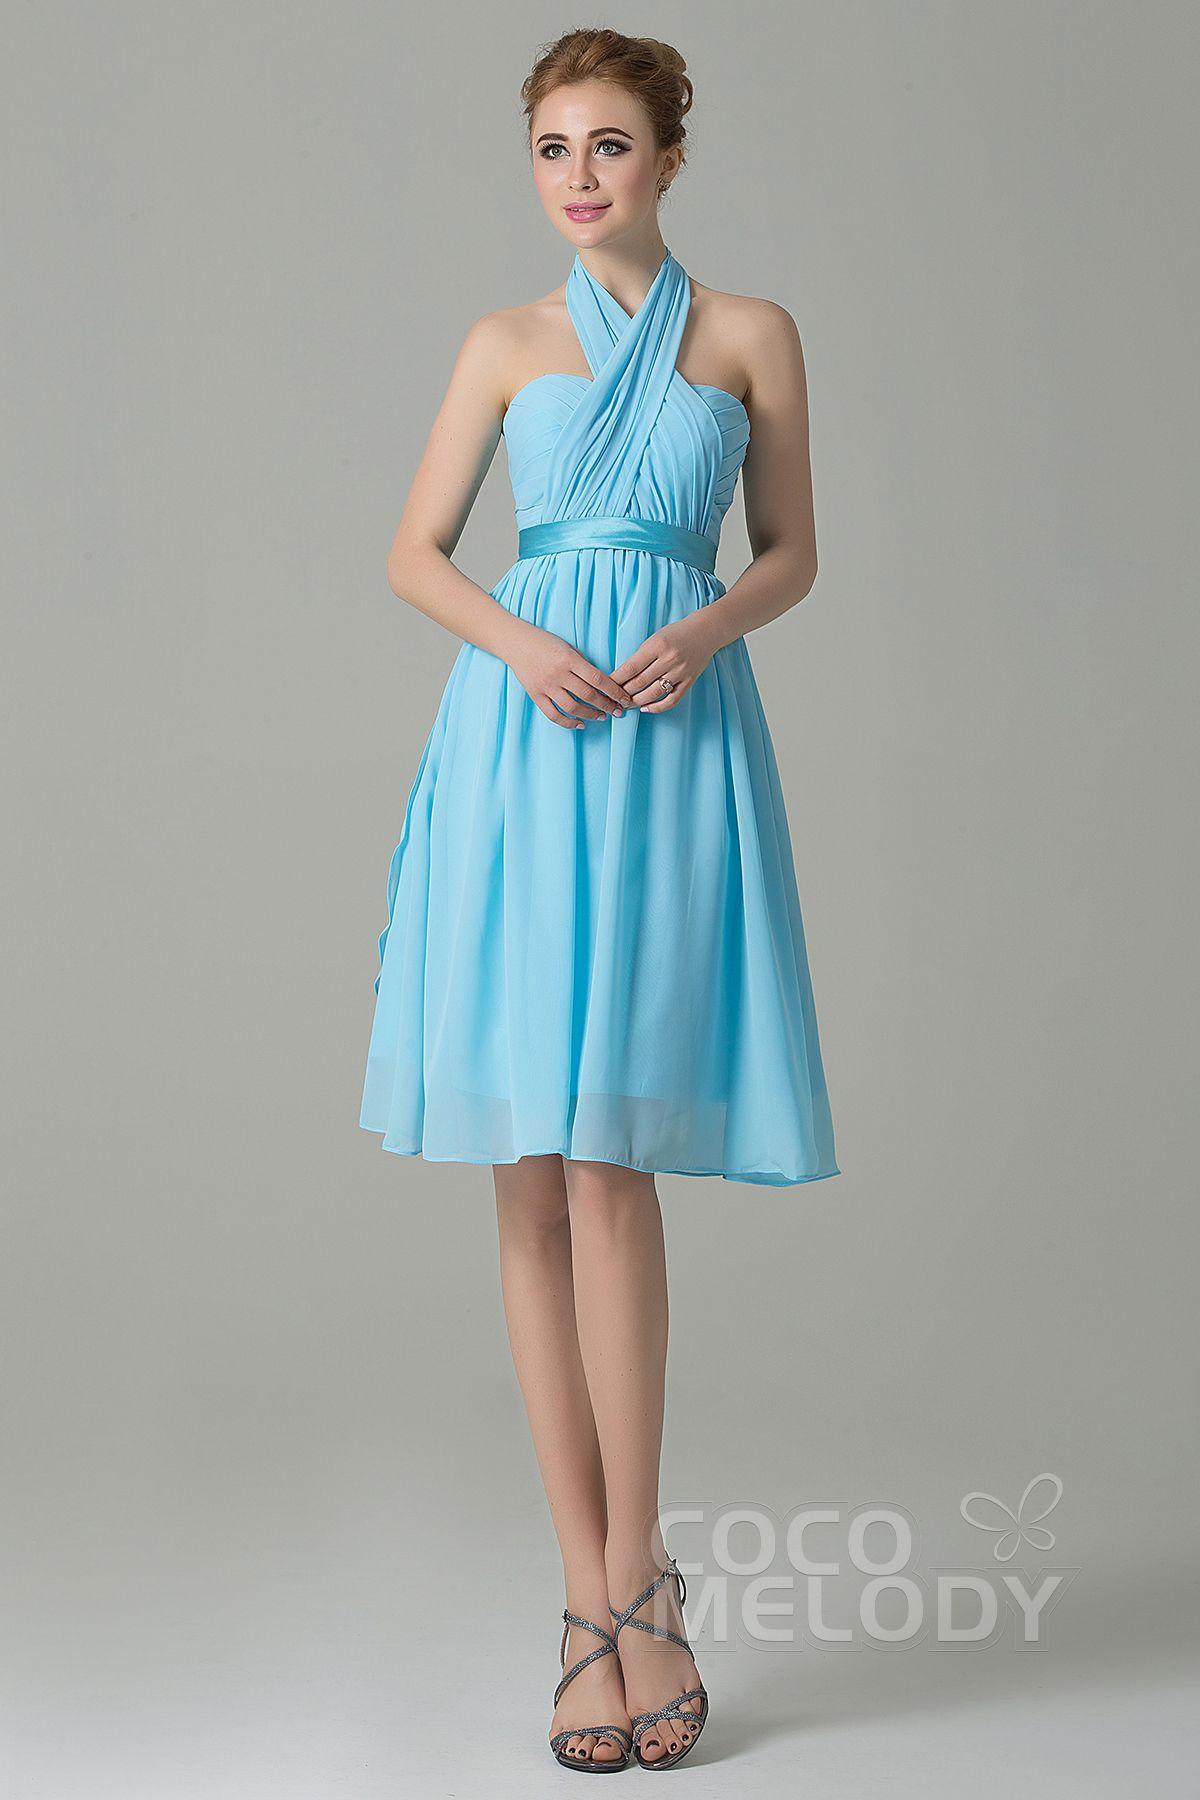 Classic aline knee length chiffon convertible bridesmaid dress with